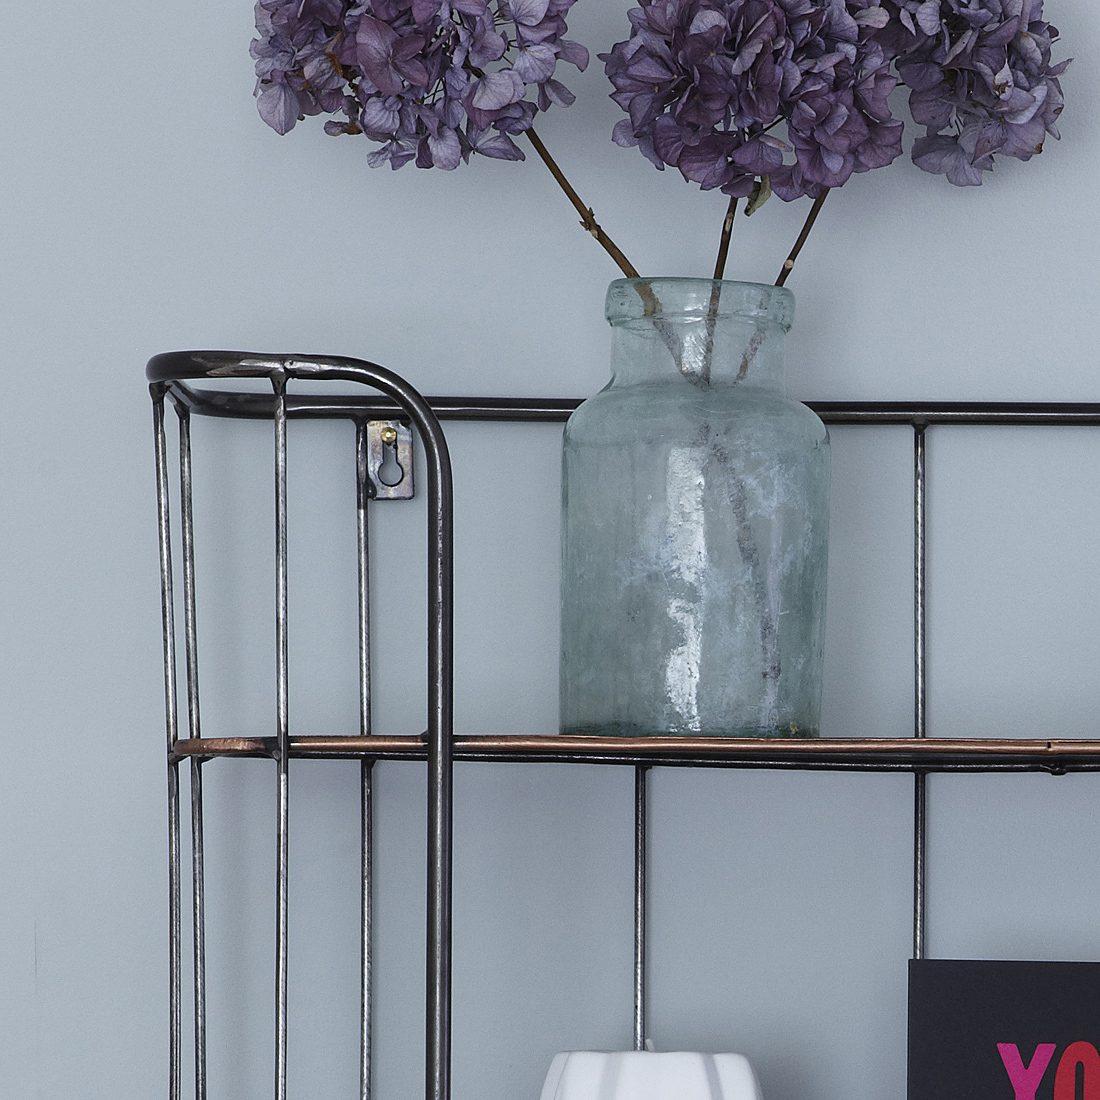 ThreeShelf Industrial Shelf Unit with Hanging Hooks